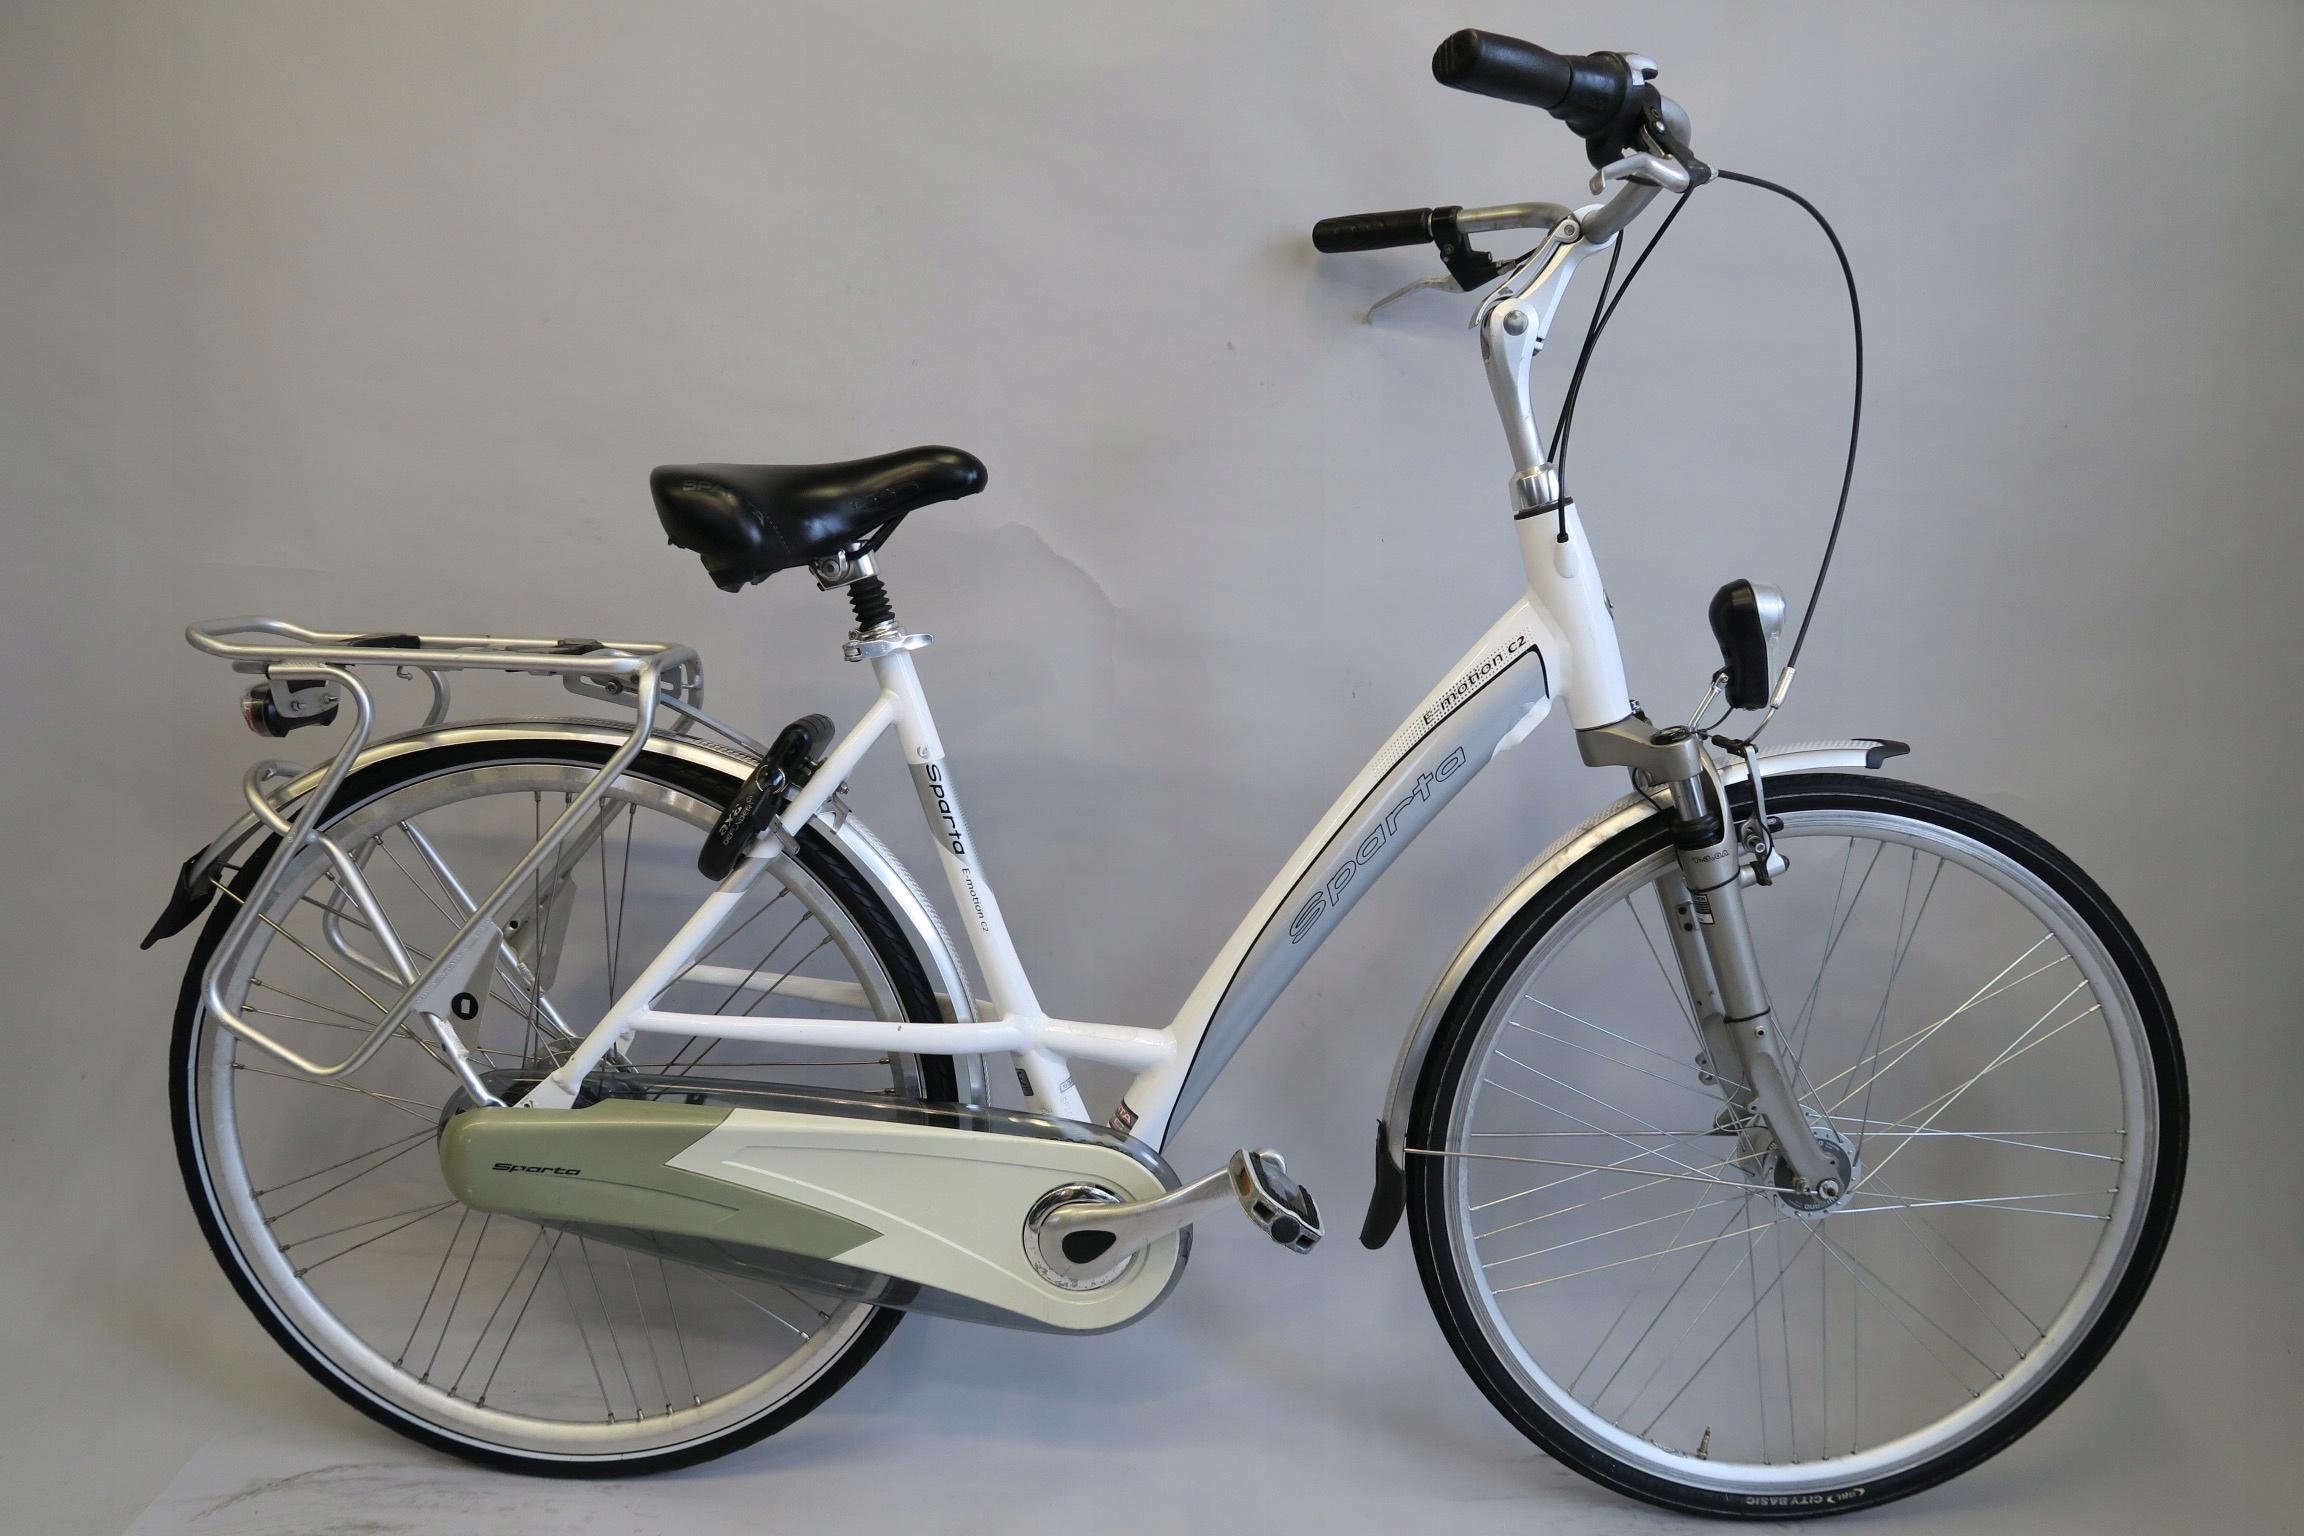 Markowy rower holenderski Sparta Emotion Nexus 8